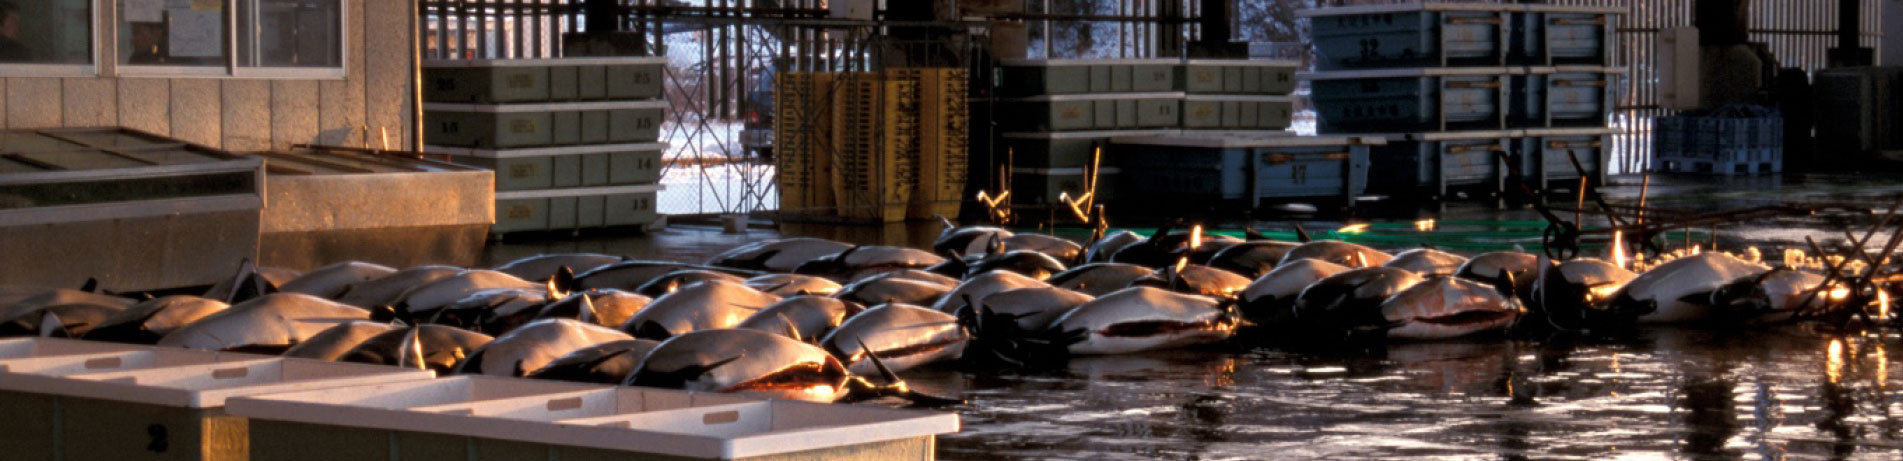 Landed Dall's porpoises in Otsuchi, Japan